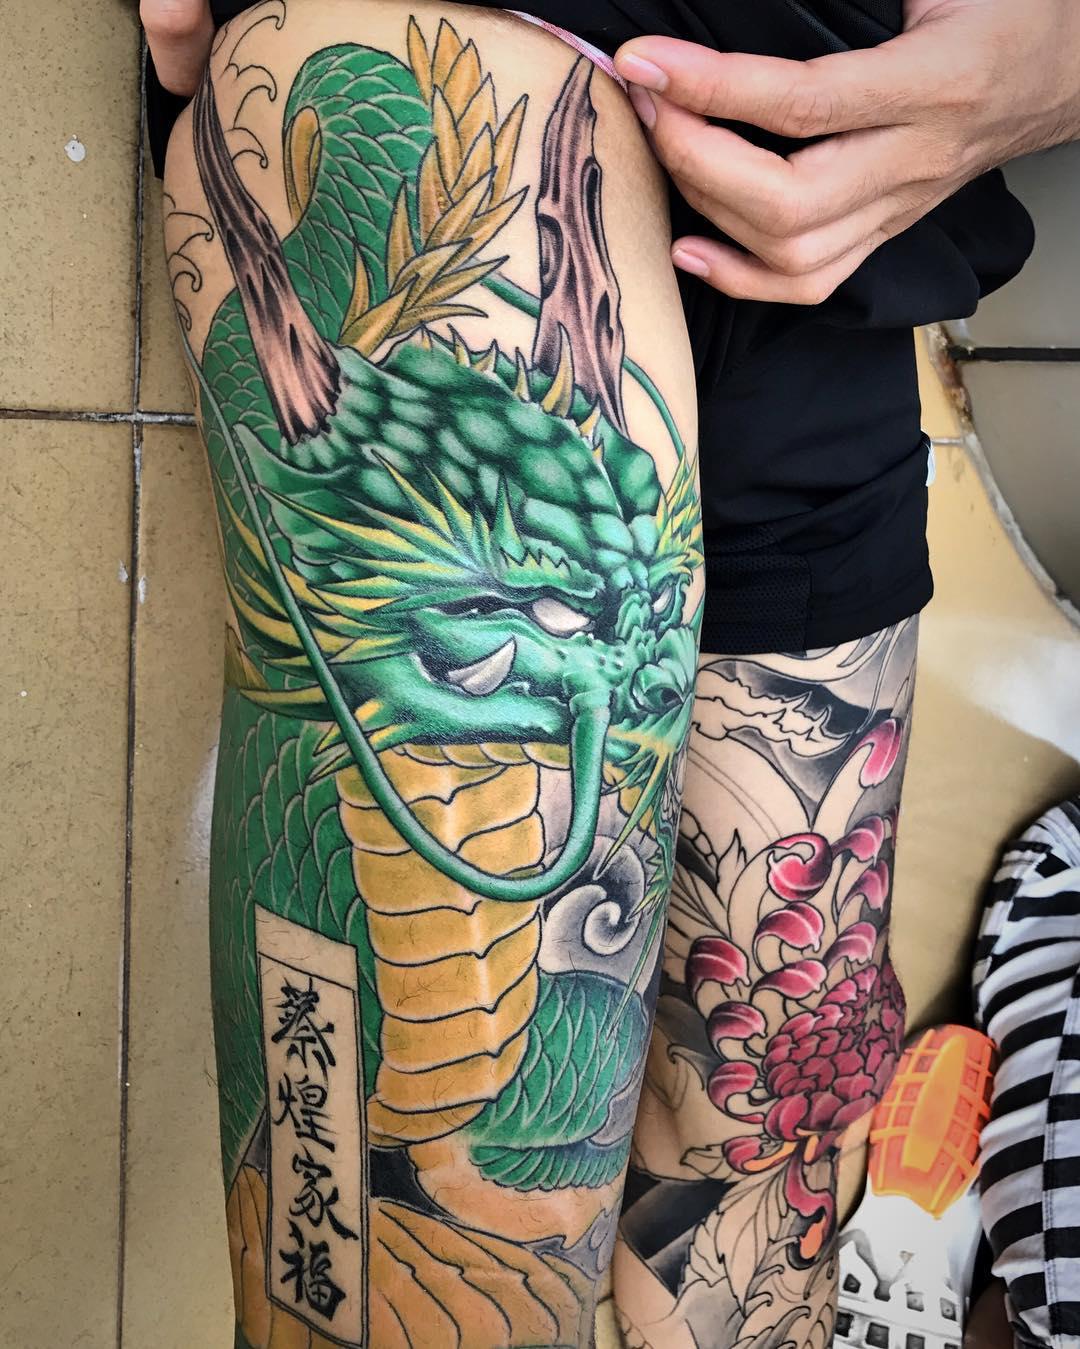 Tattoo Designs Unique: 75+ Unique Dragon Tattoo Designs & Meanings